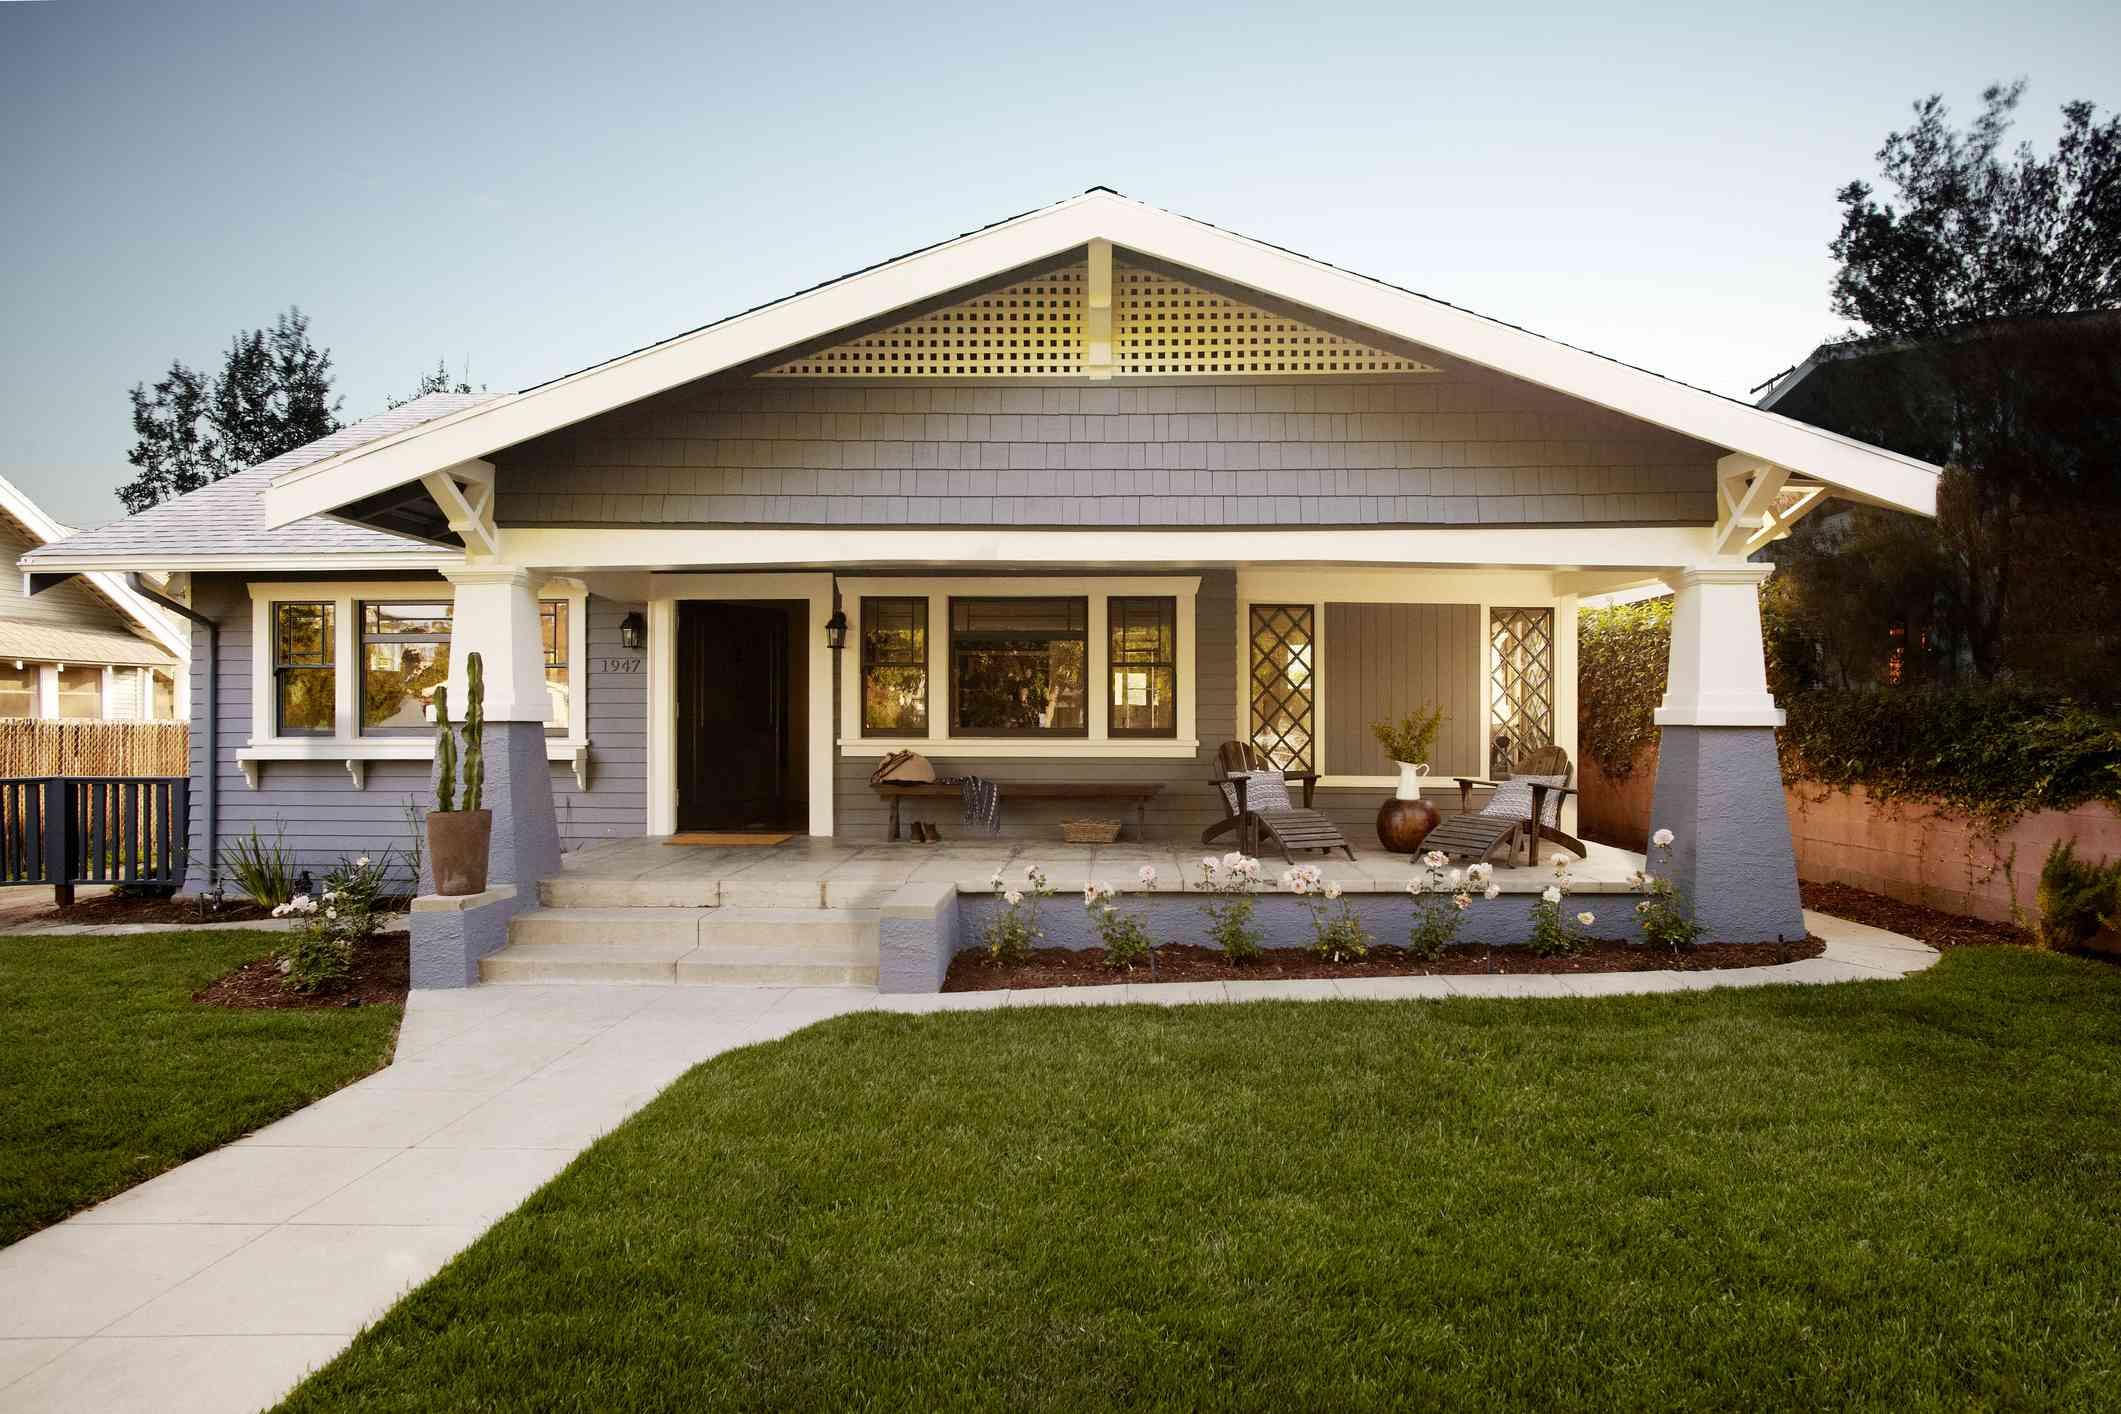 Craftsman-style house